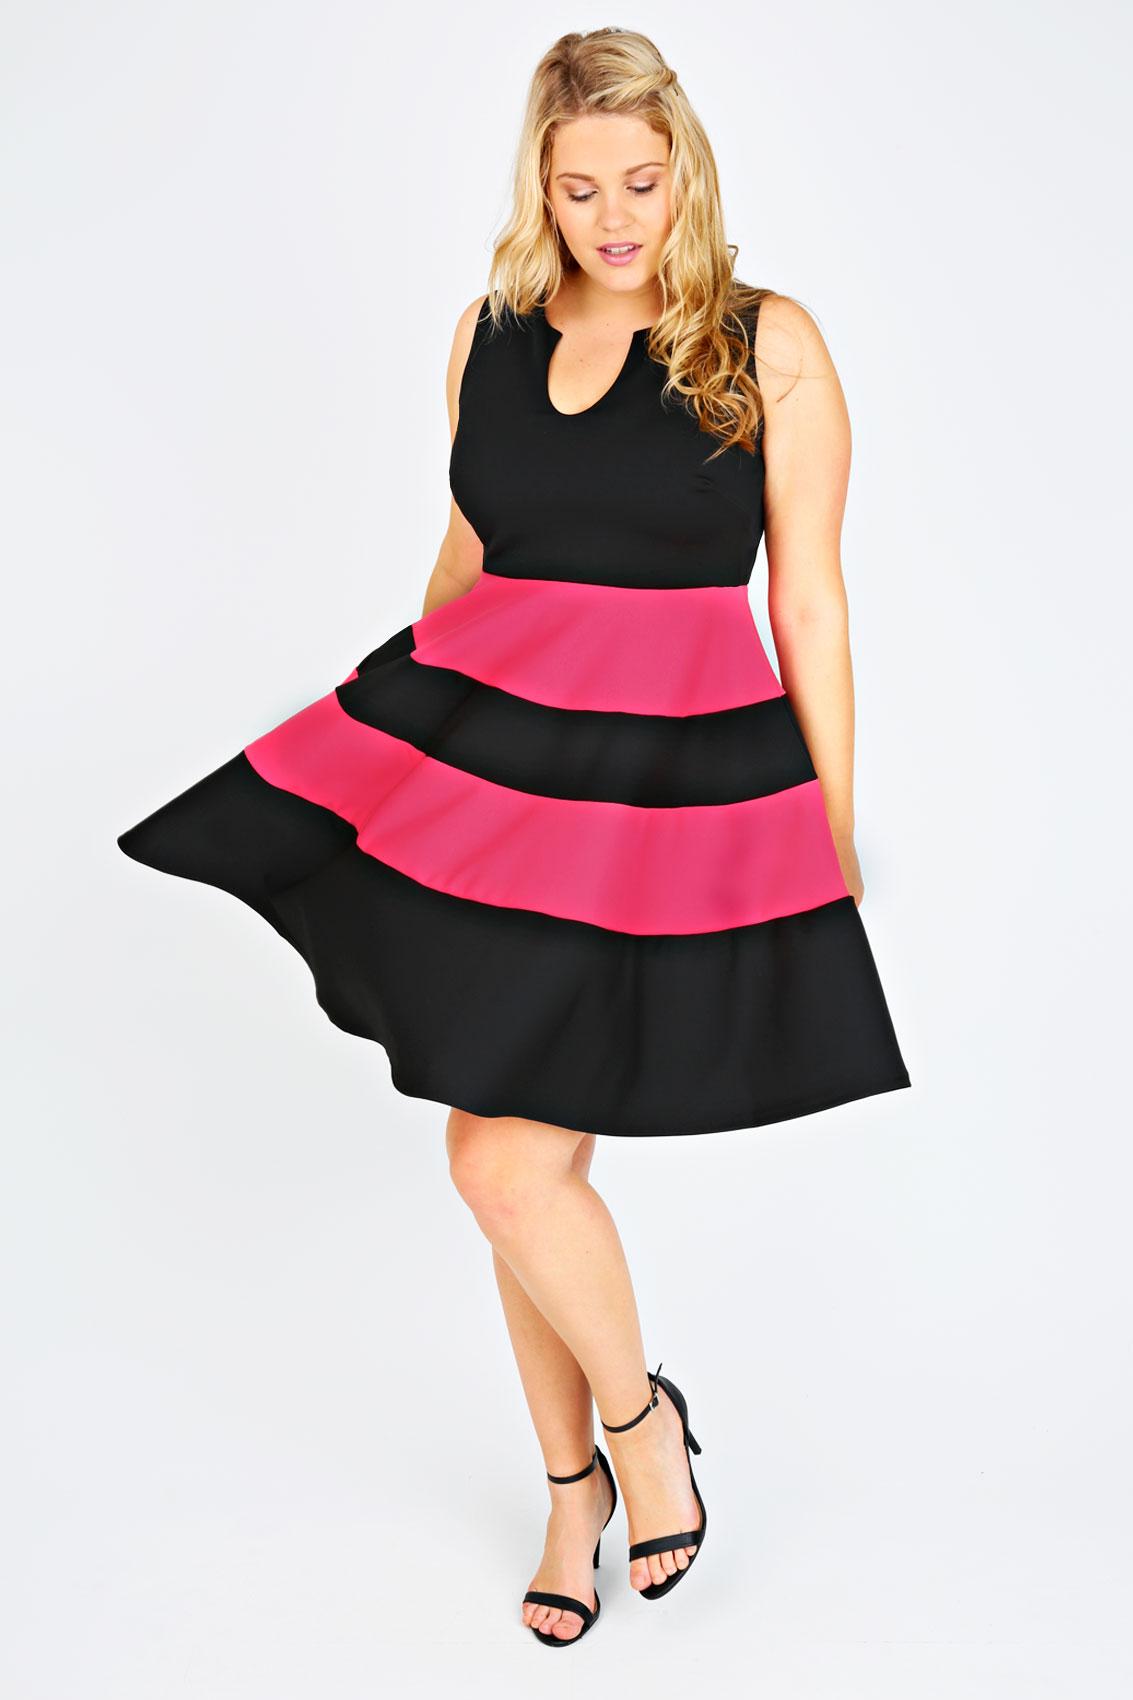 Pink Neon Skater Dress